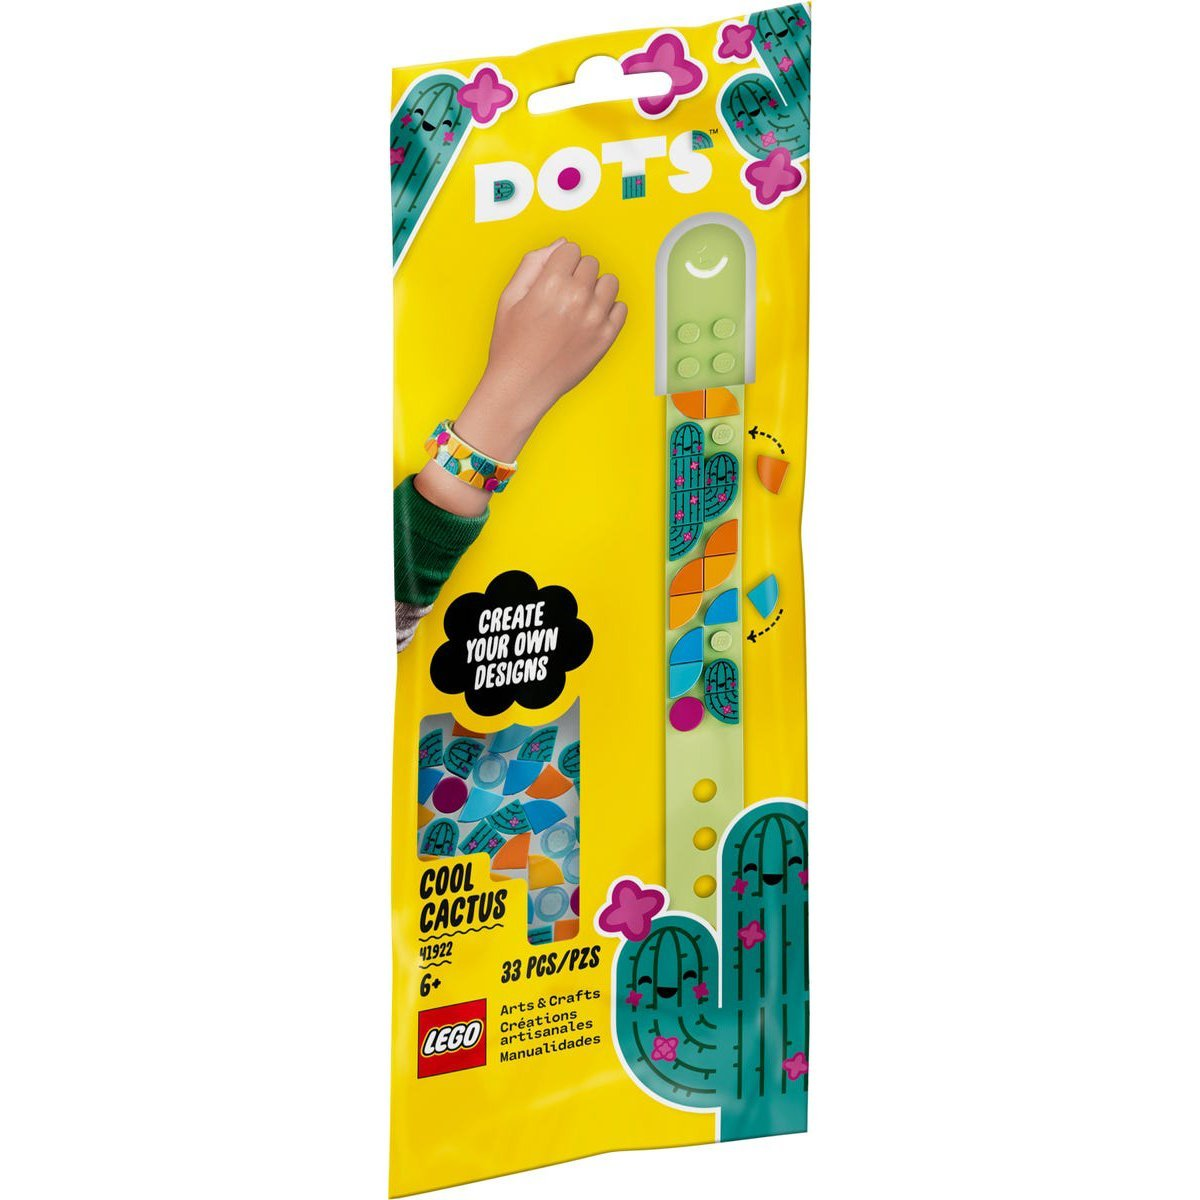 LEGO 樂高積木 DOTS 豆豆系列 41922 豆豆手環-酷炫仙人掌